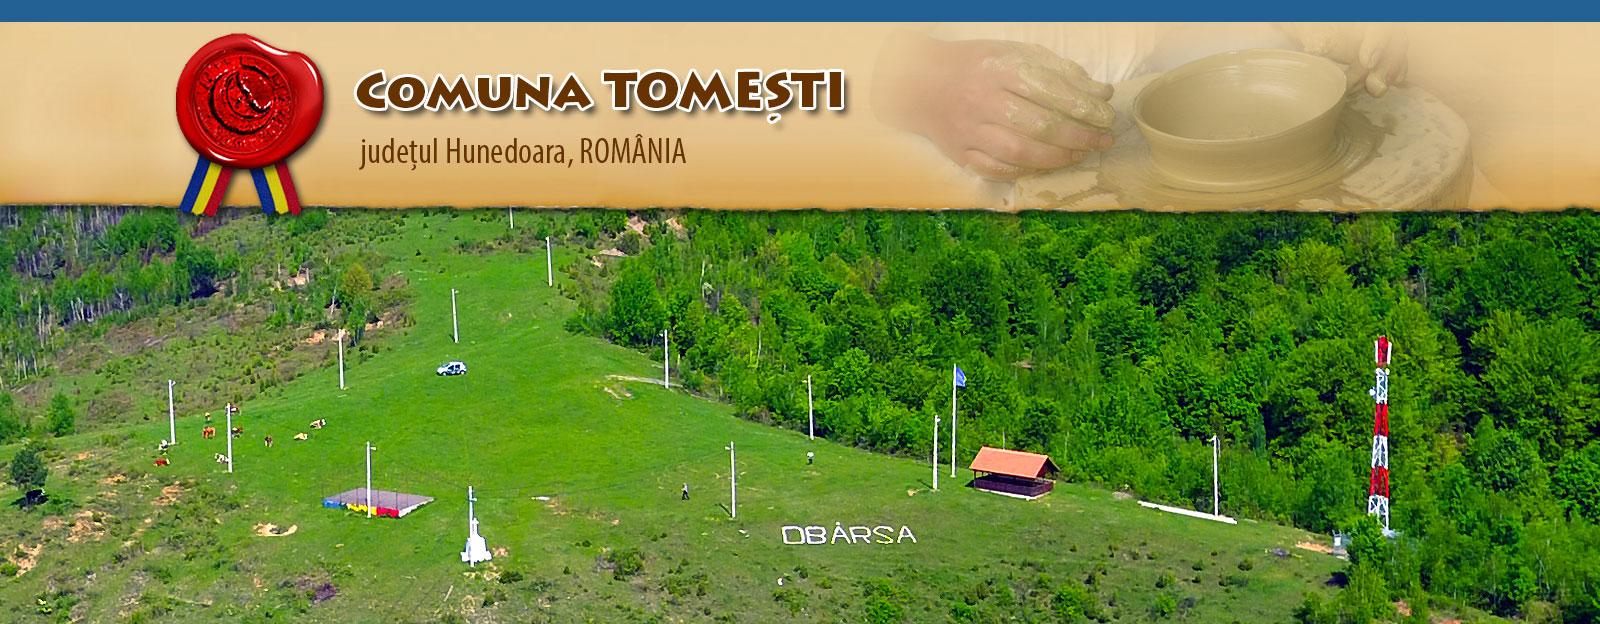 Consiliul Local si Primaria Comunei Tomesti